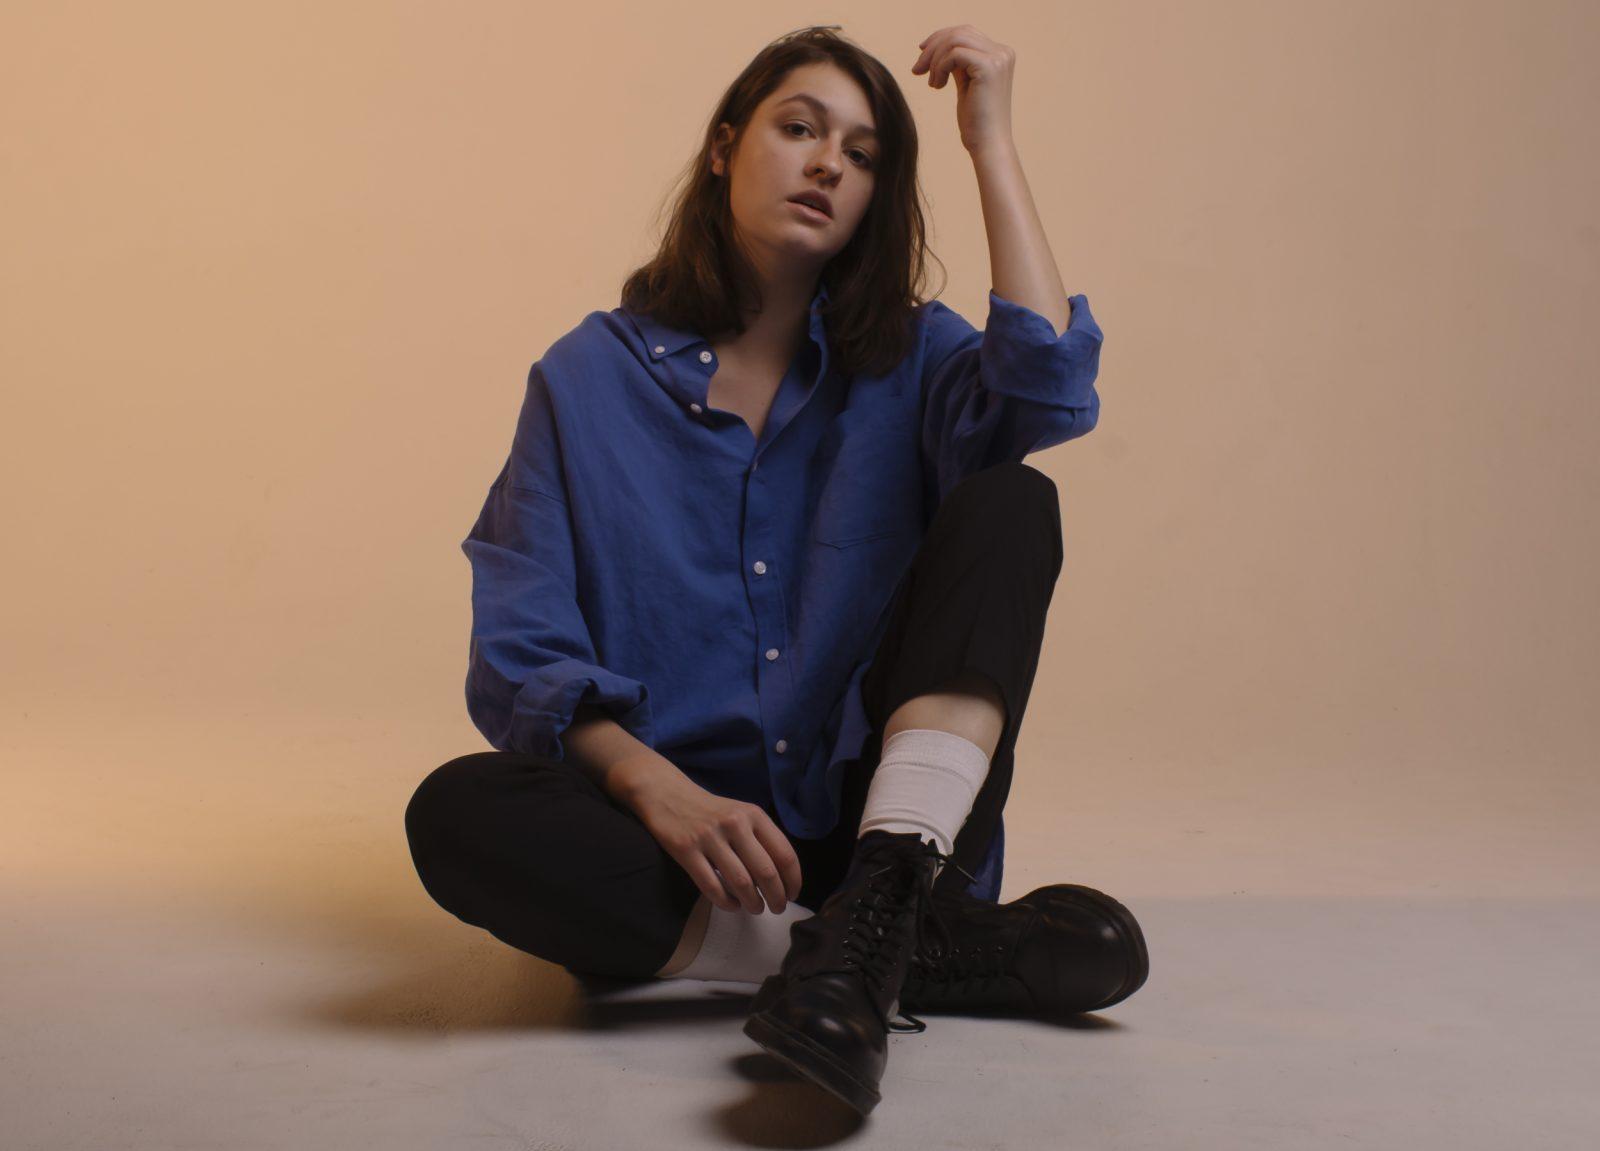 Lou-Adriane Cassidy mène une carrière musicale en plein essor